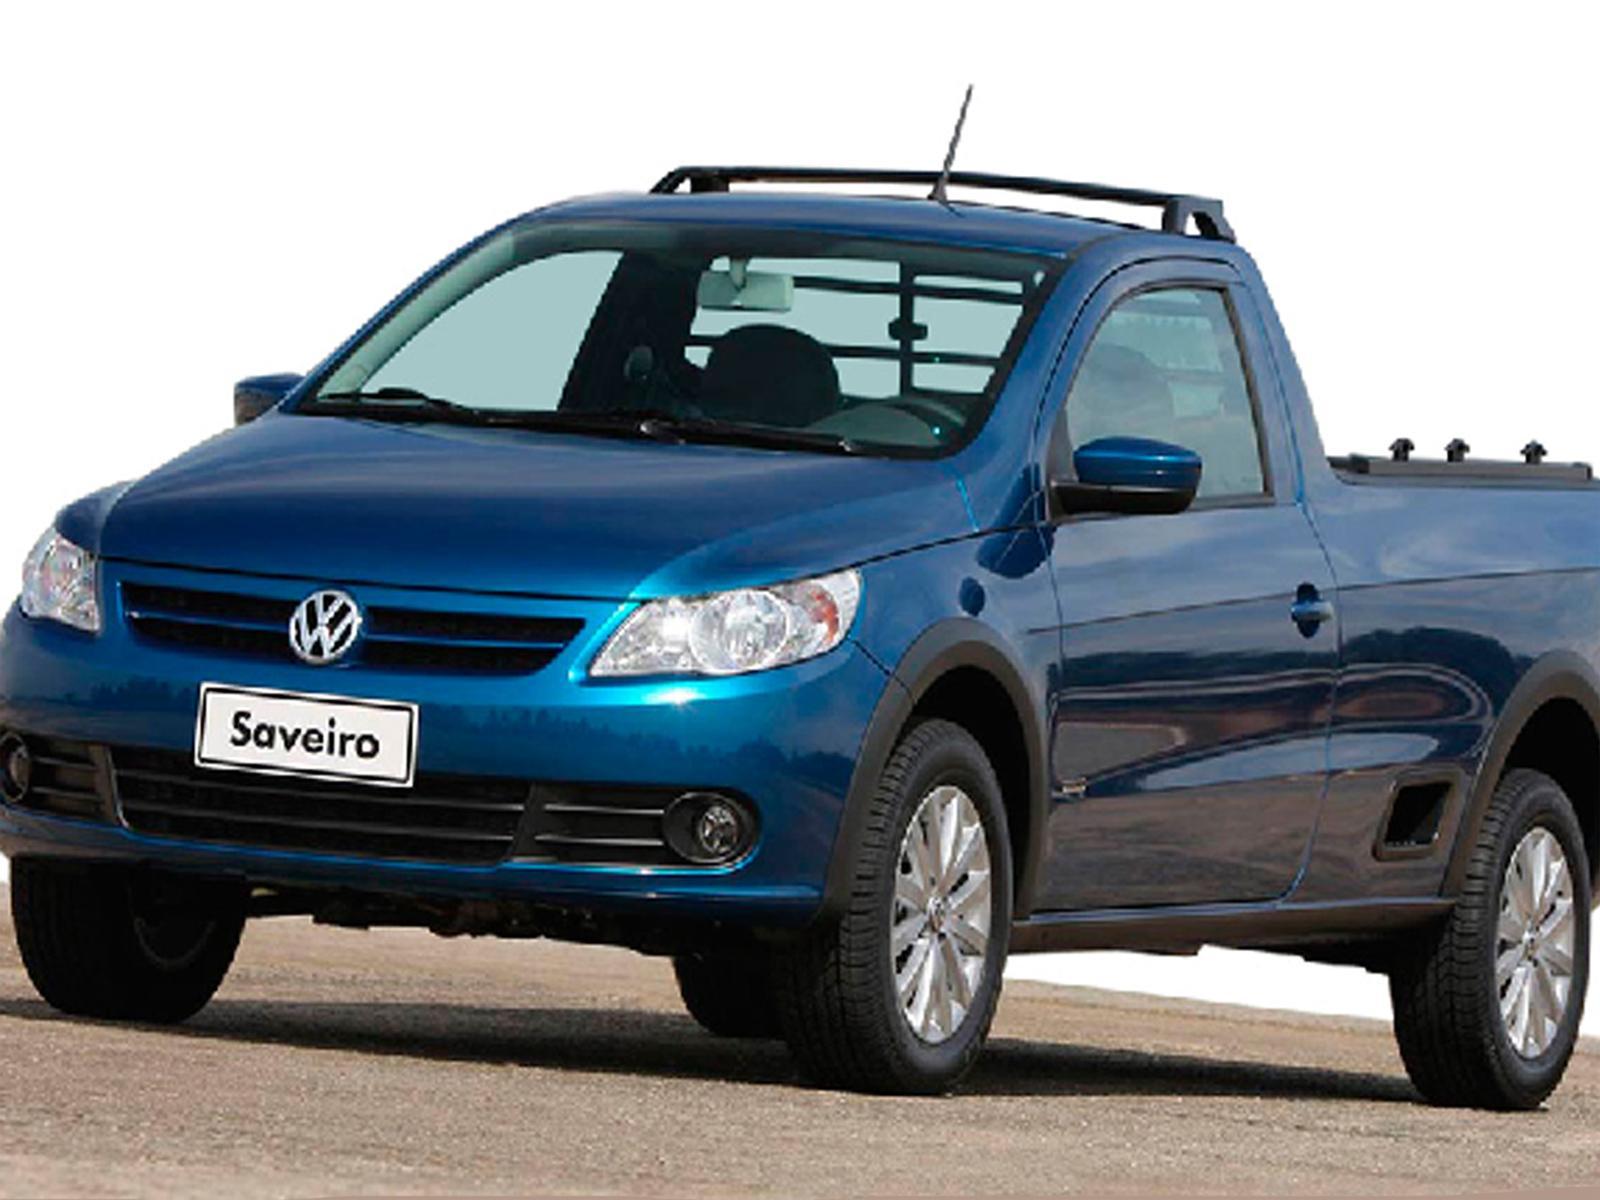 Datsun 1200 Pick Up - Bing images